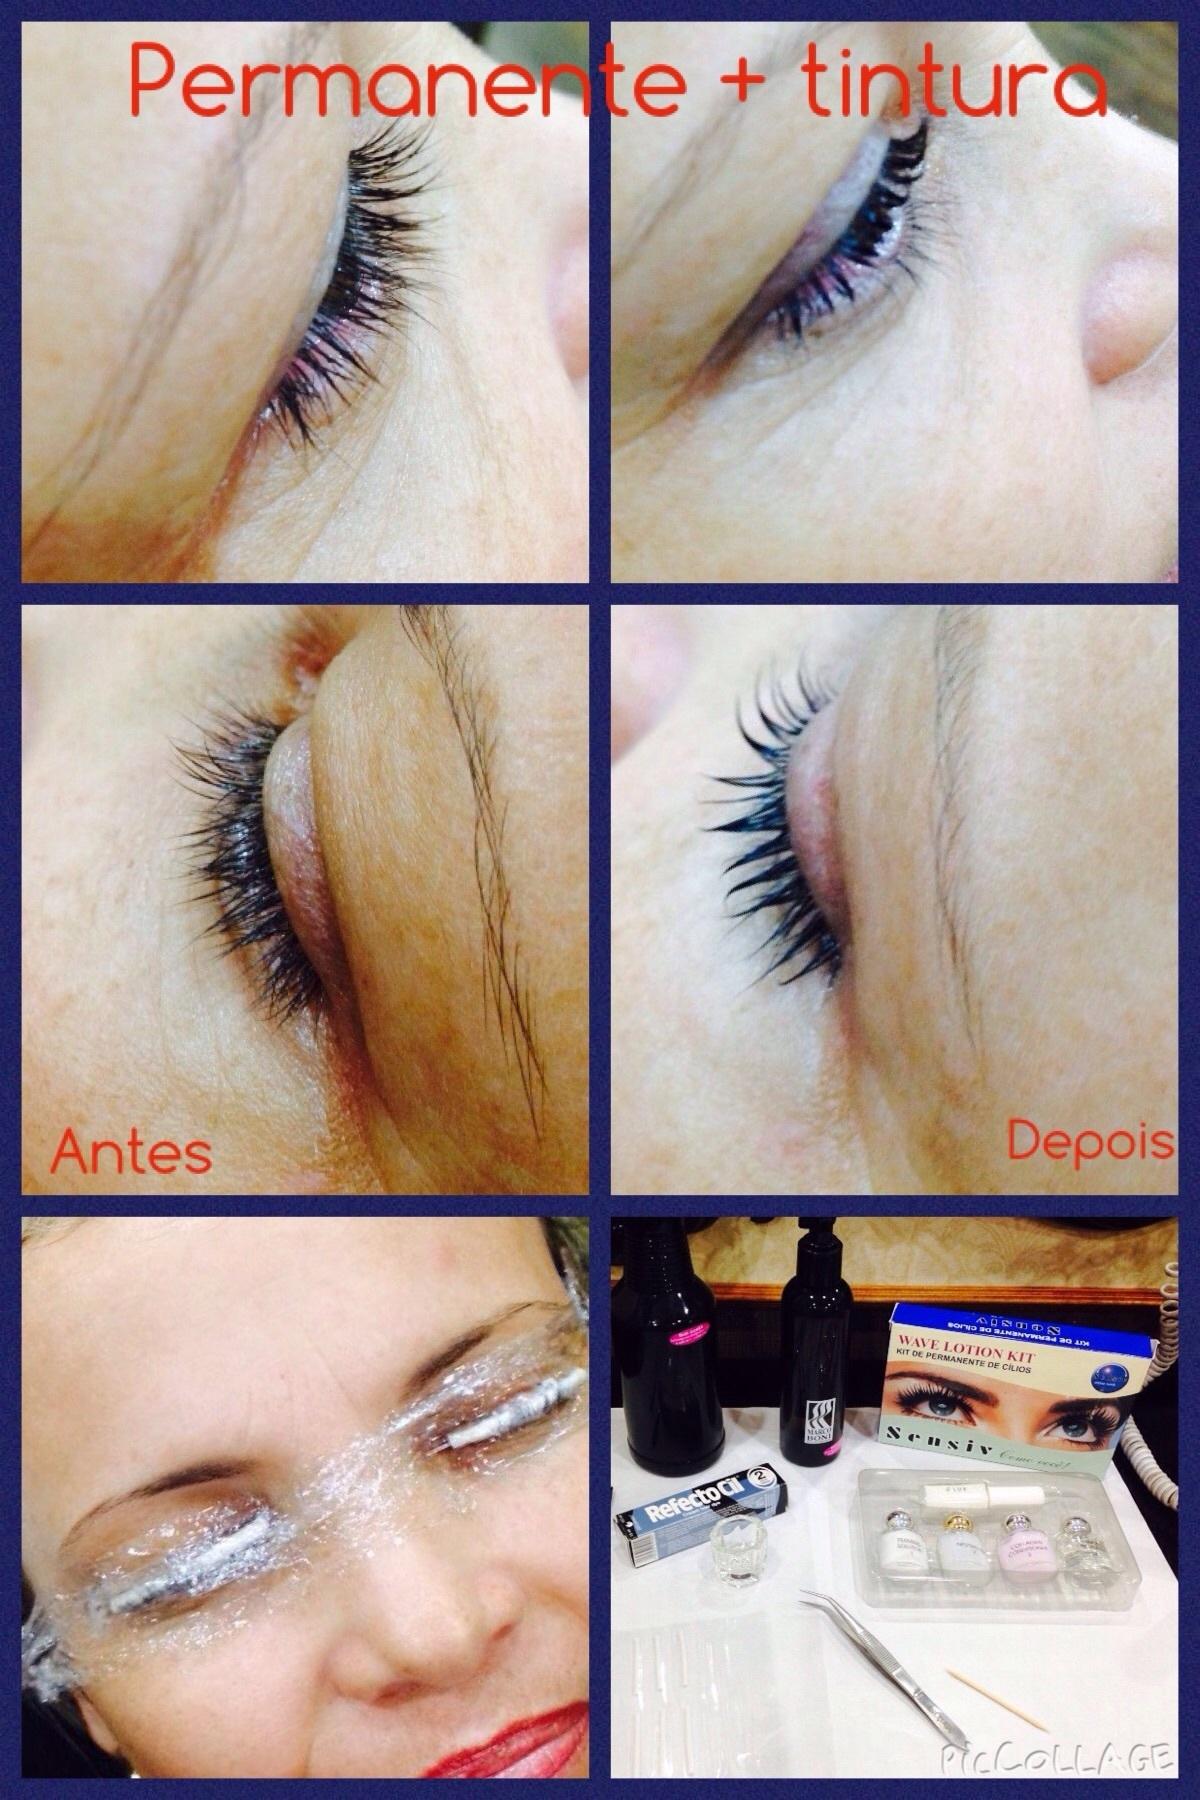 Permanente e tintura de cílios  dermopigmentador(a) designer de sobrancelhas maquiador(a) micropigmentador(a)